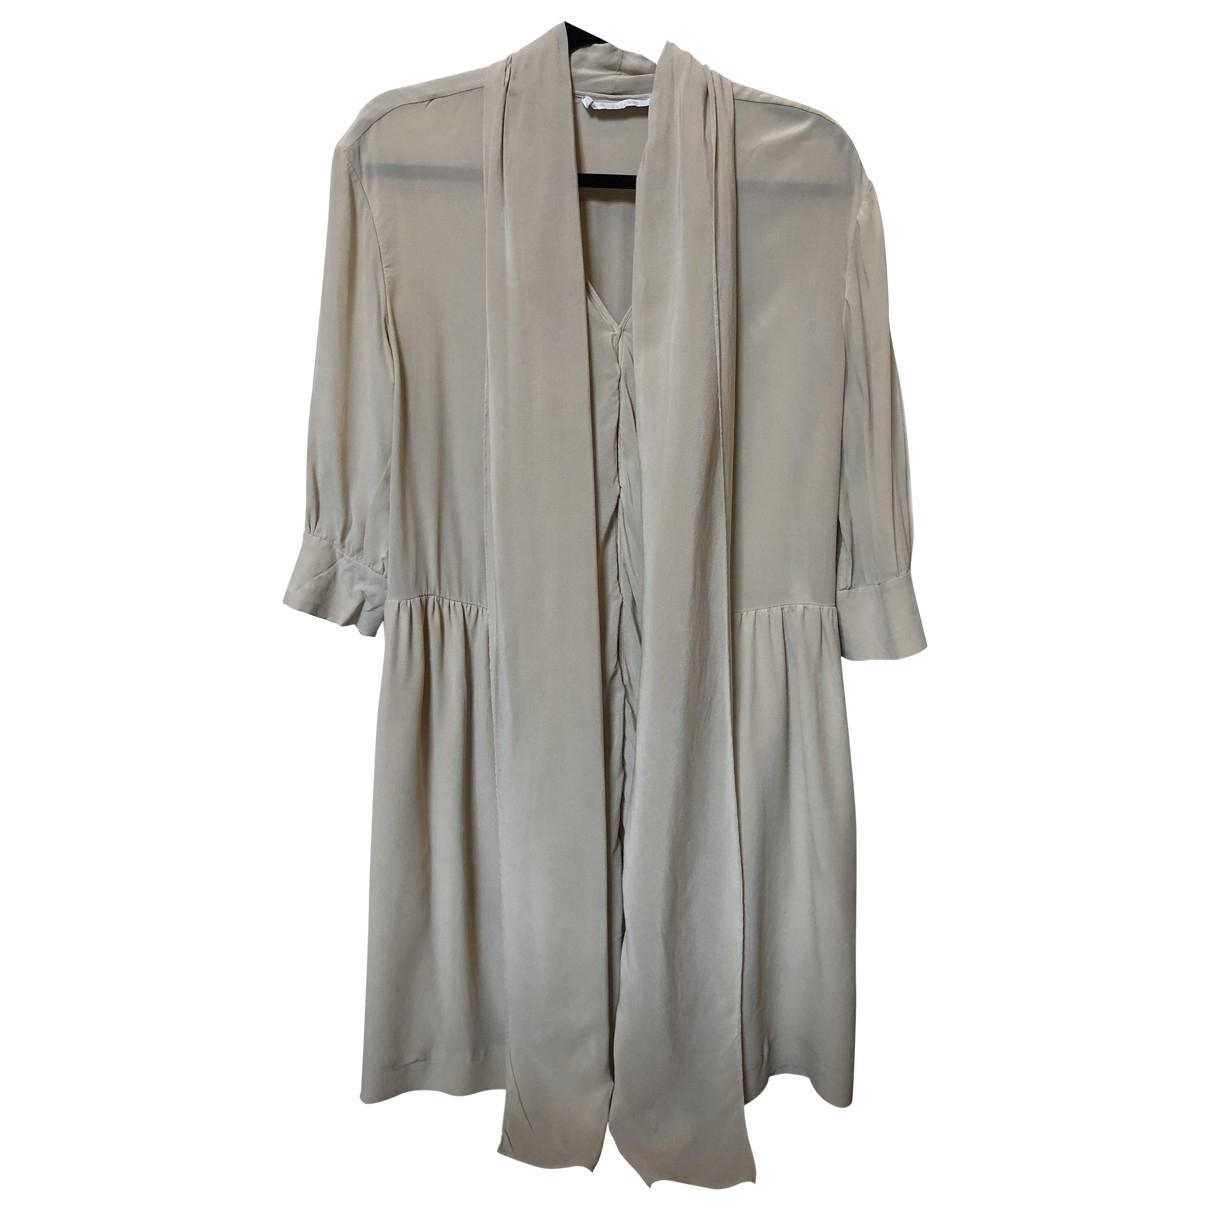 Chloé \N Beige Silk dress for Women 44 FR